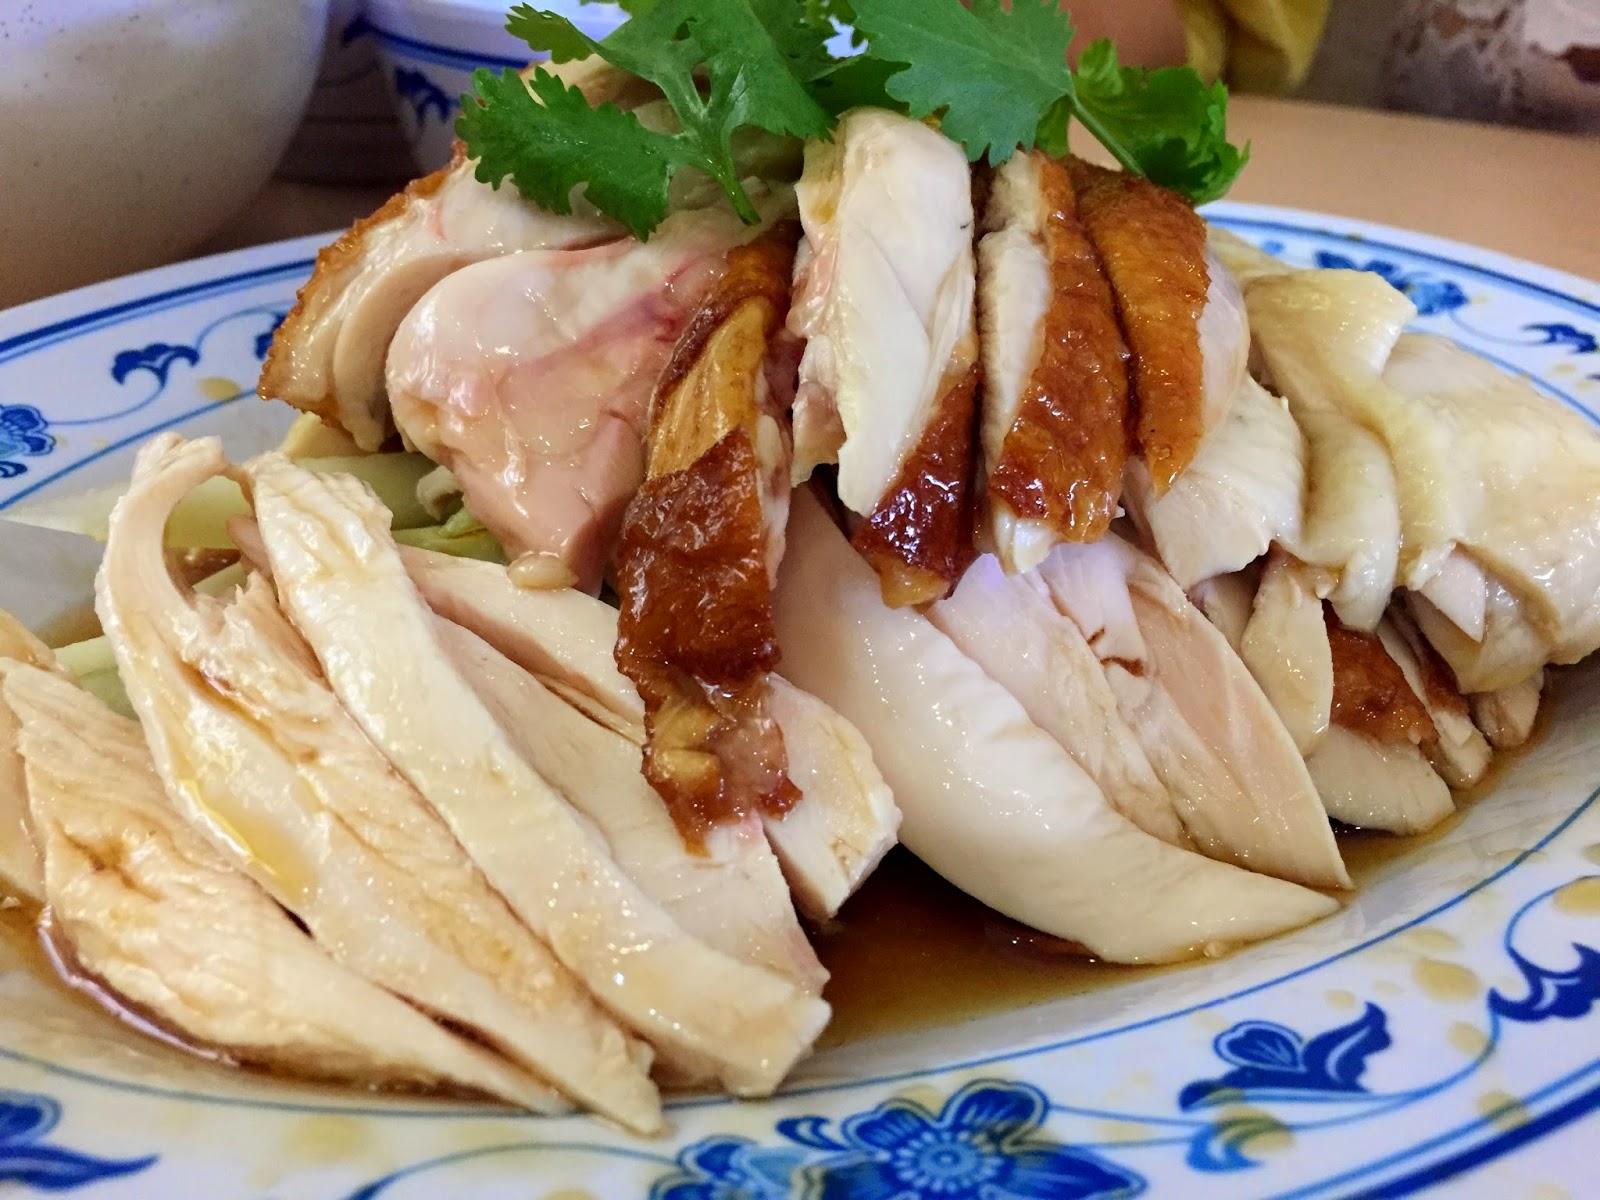 The Foodie's Guide to Singaporean Food | AspirantSG - Food, Travel,  Lifestyle & Social Media